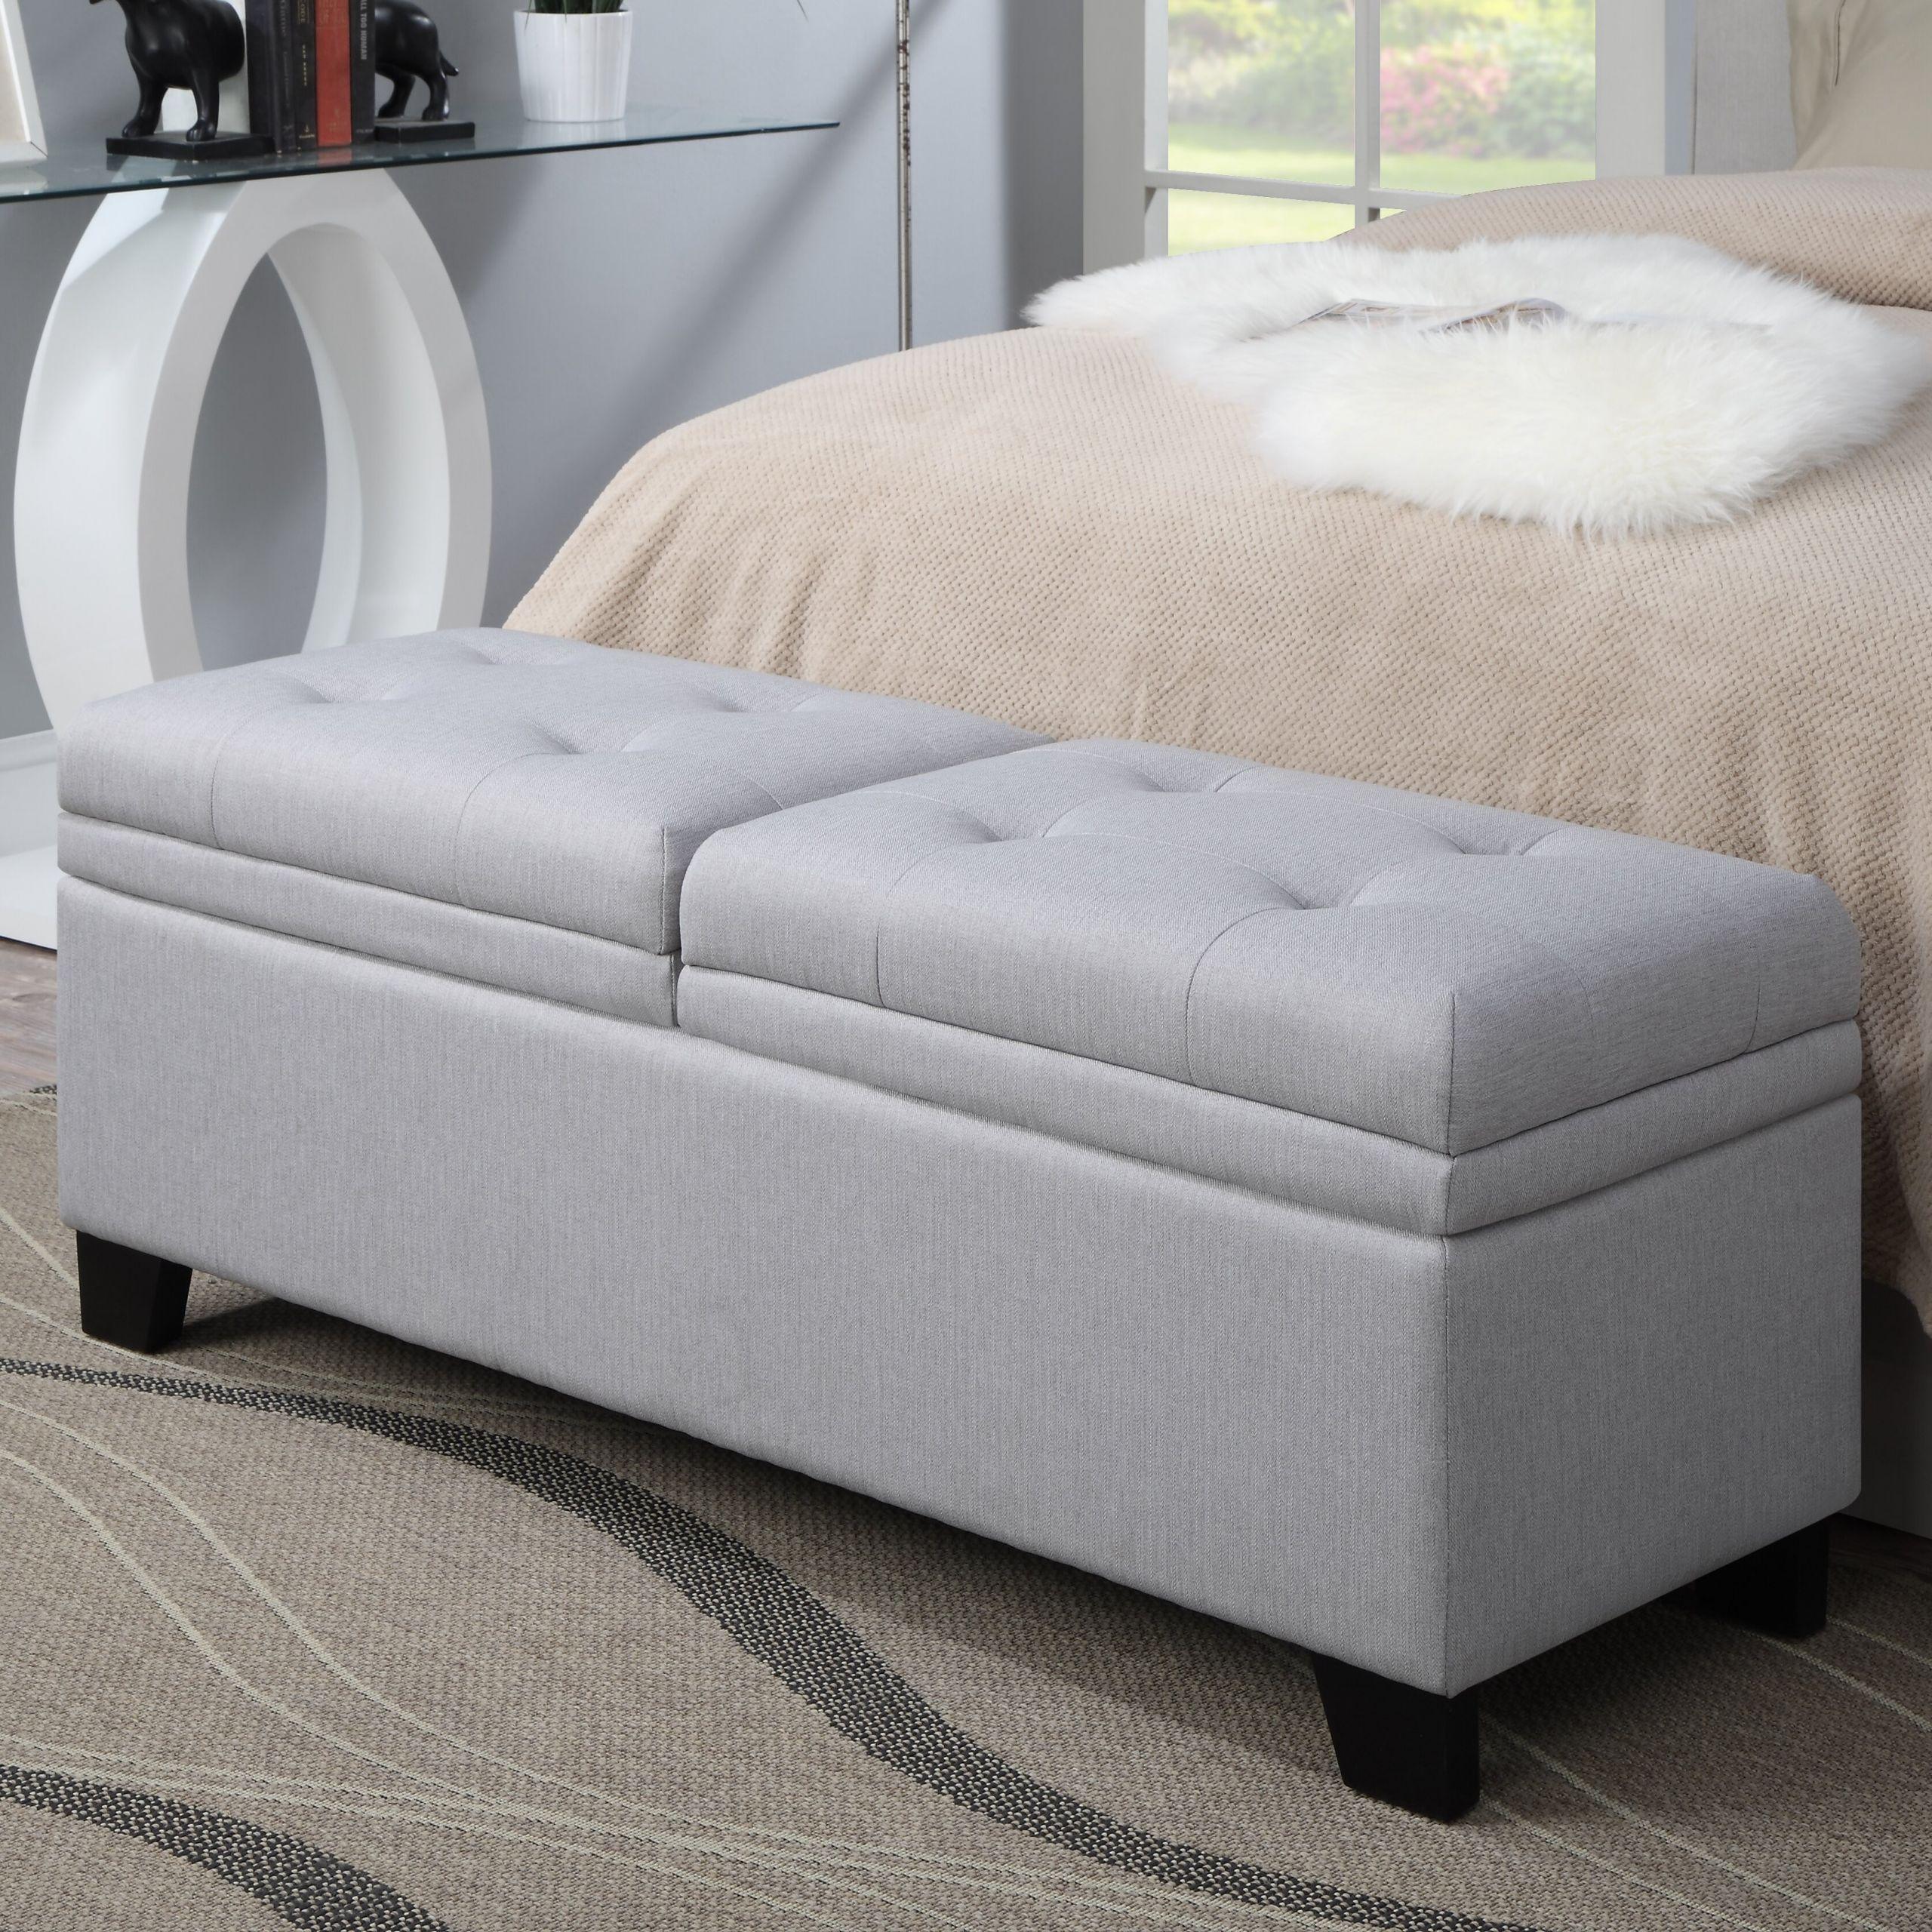 Storage Bench Bedroom  PRI Lilac Fields Upholstered Bedroom Storage Bench